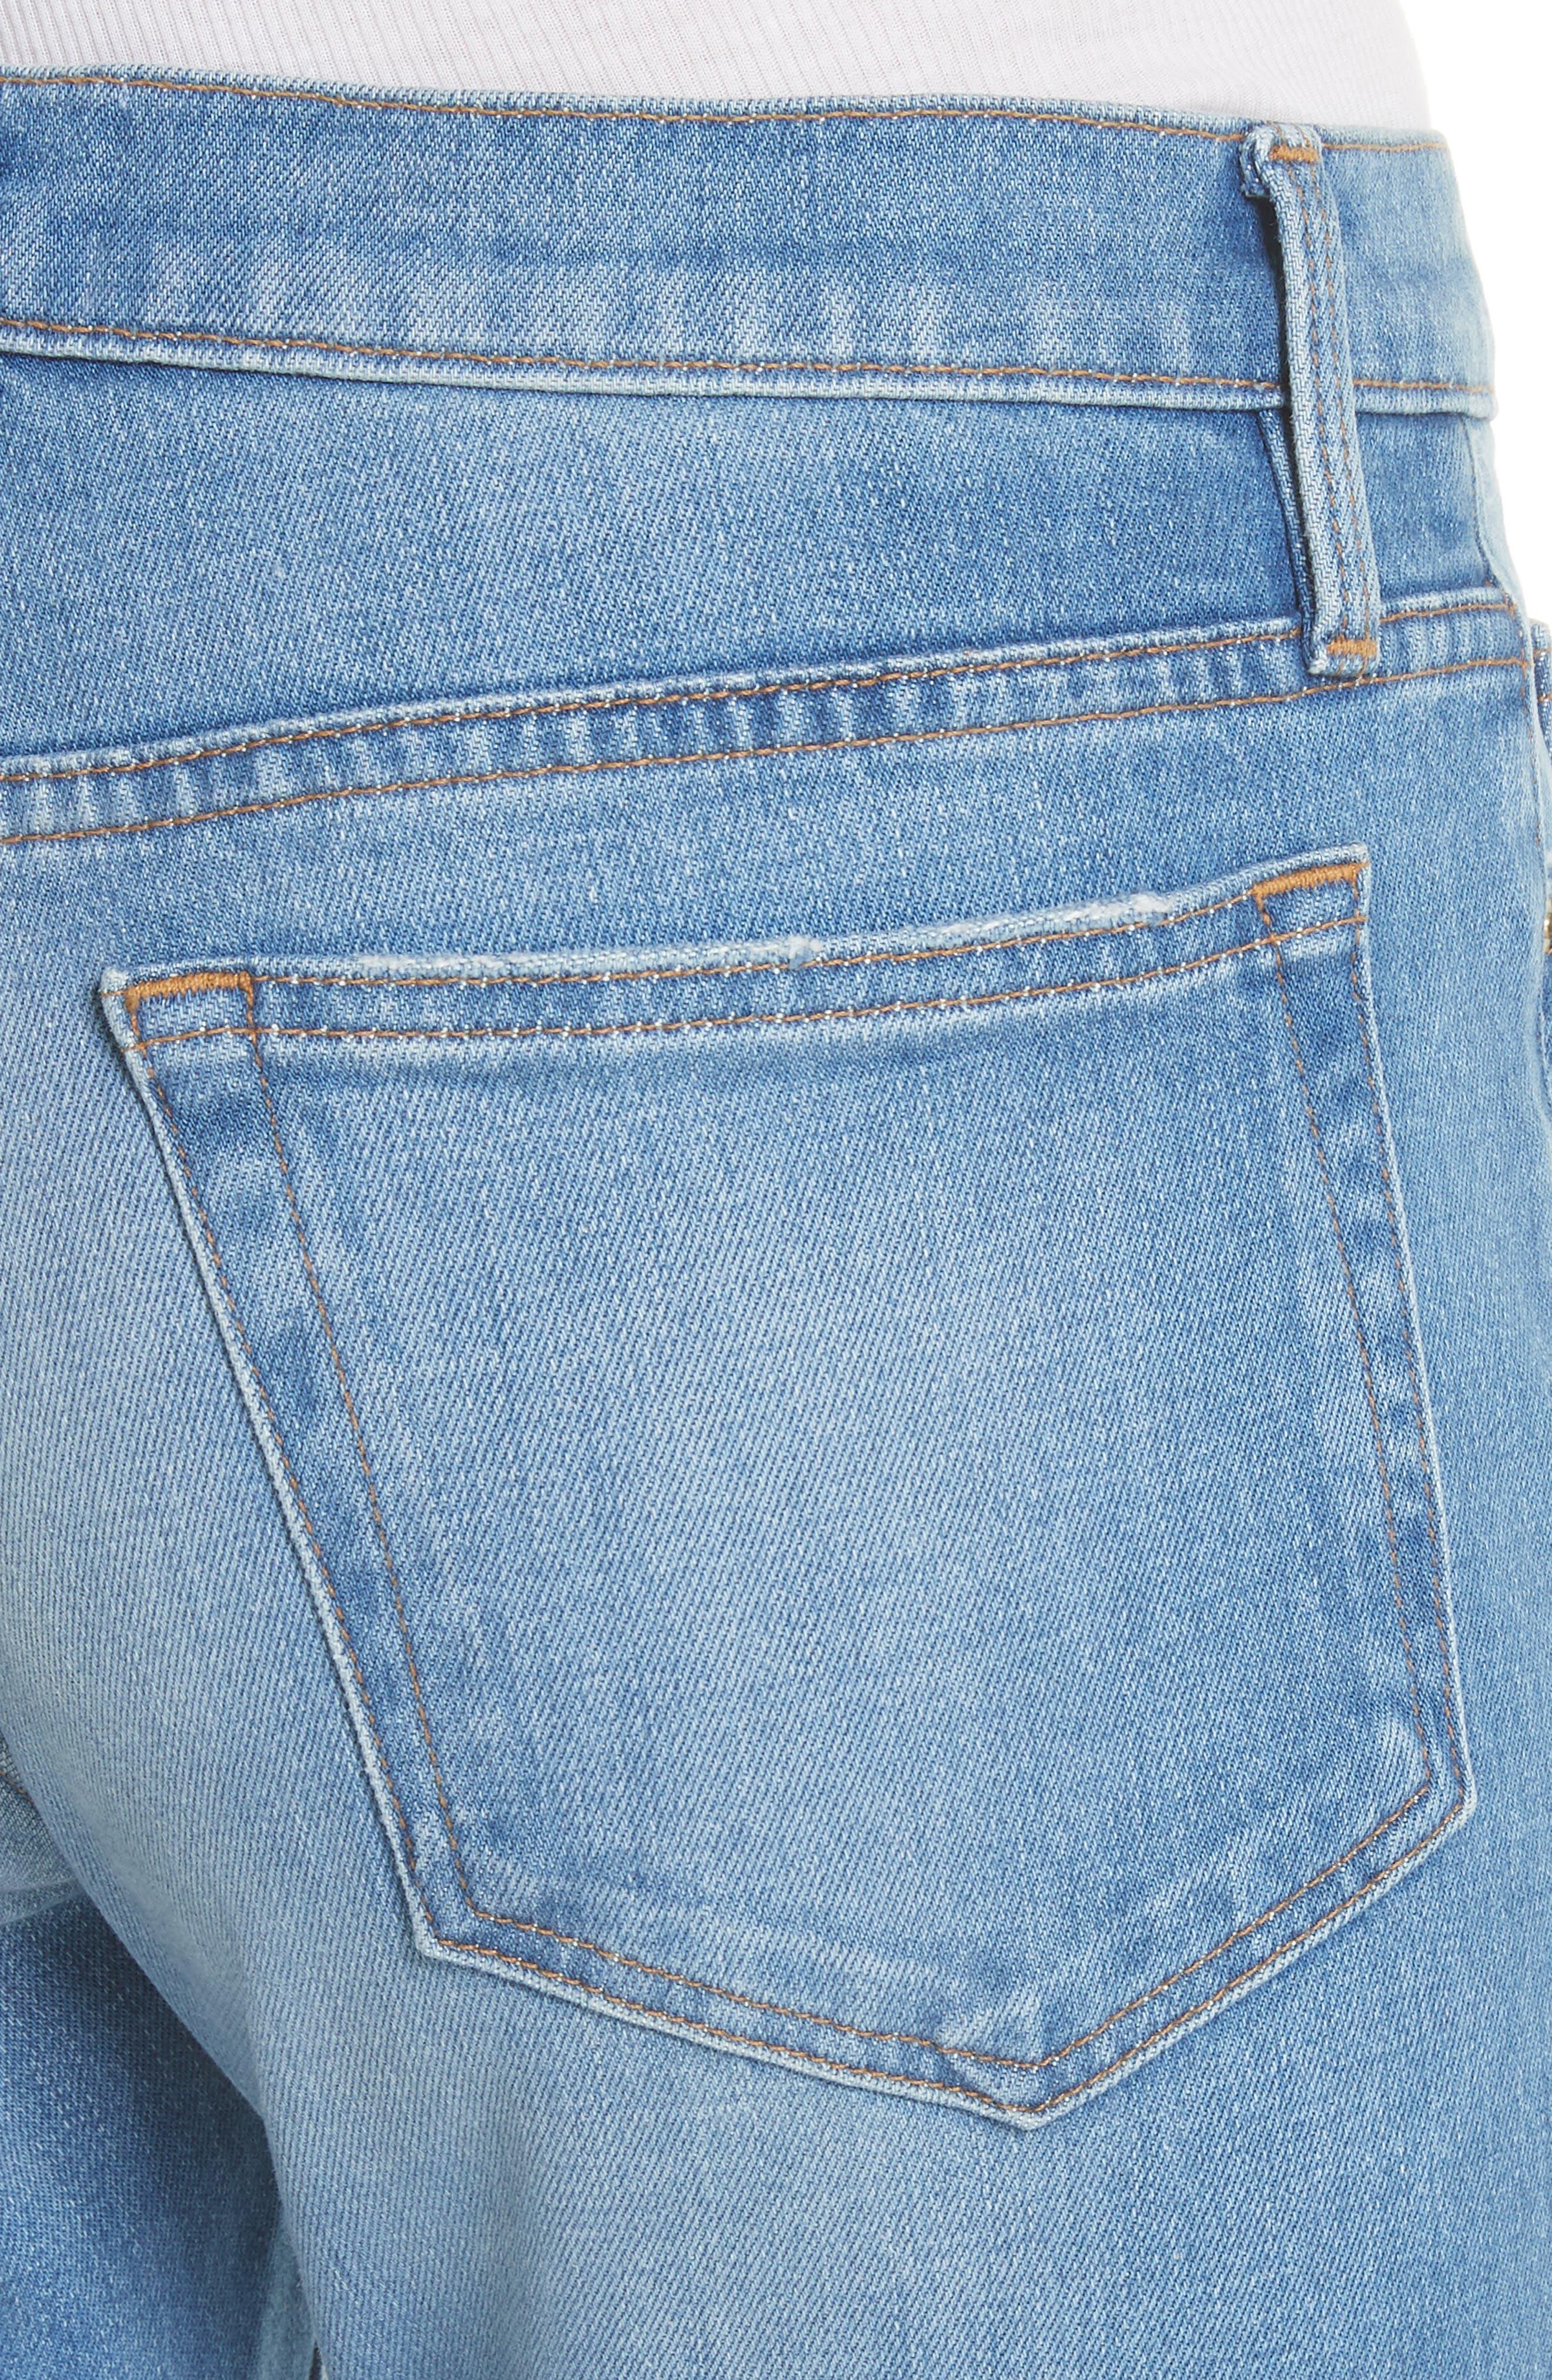 Le Boy Released Cut Hem Straight Leg Jeans,                             Alternate thumbnail 4, color,                             WHITFIELD